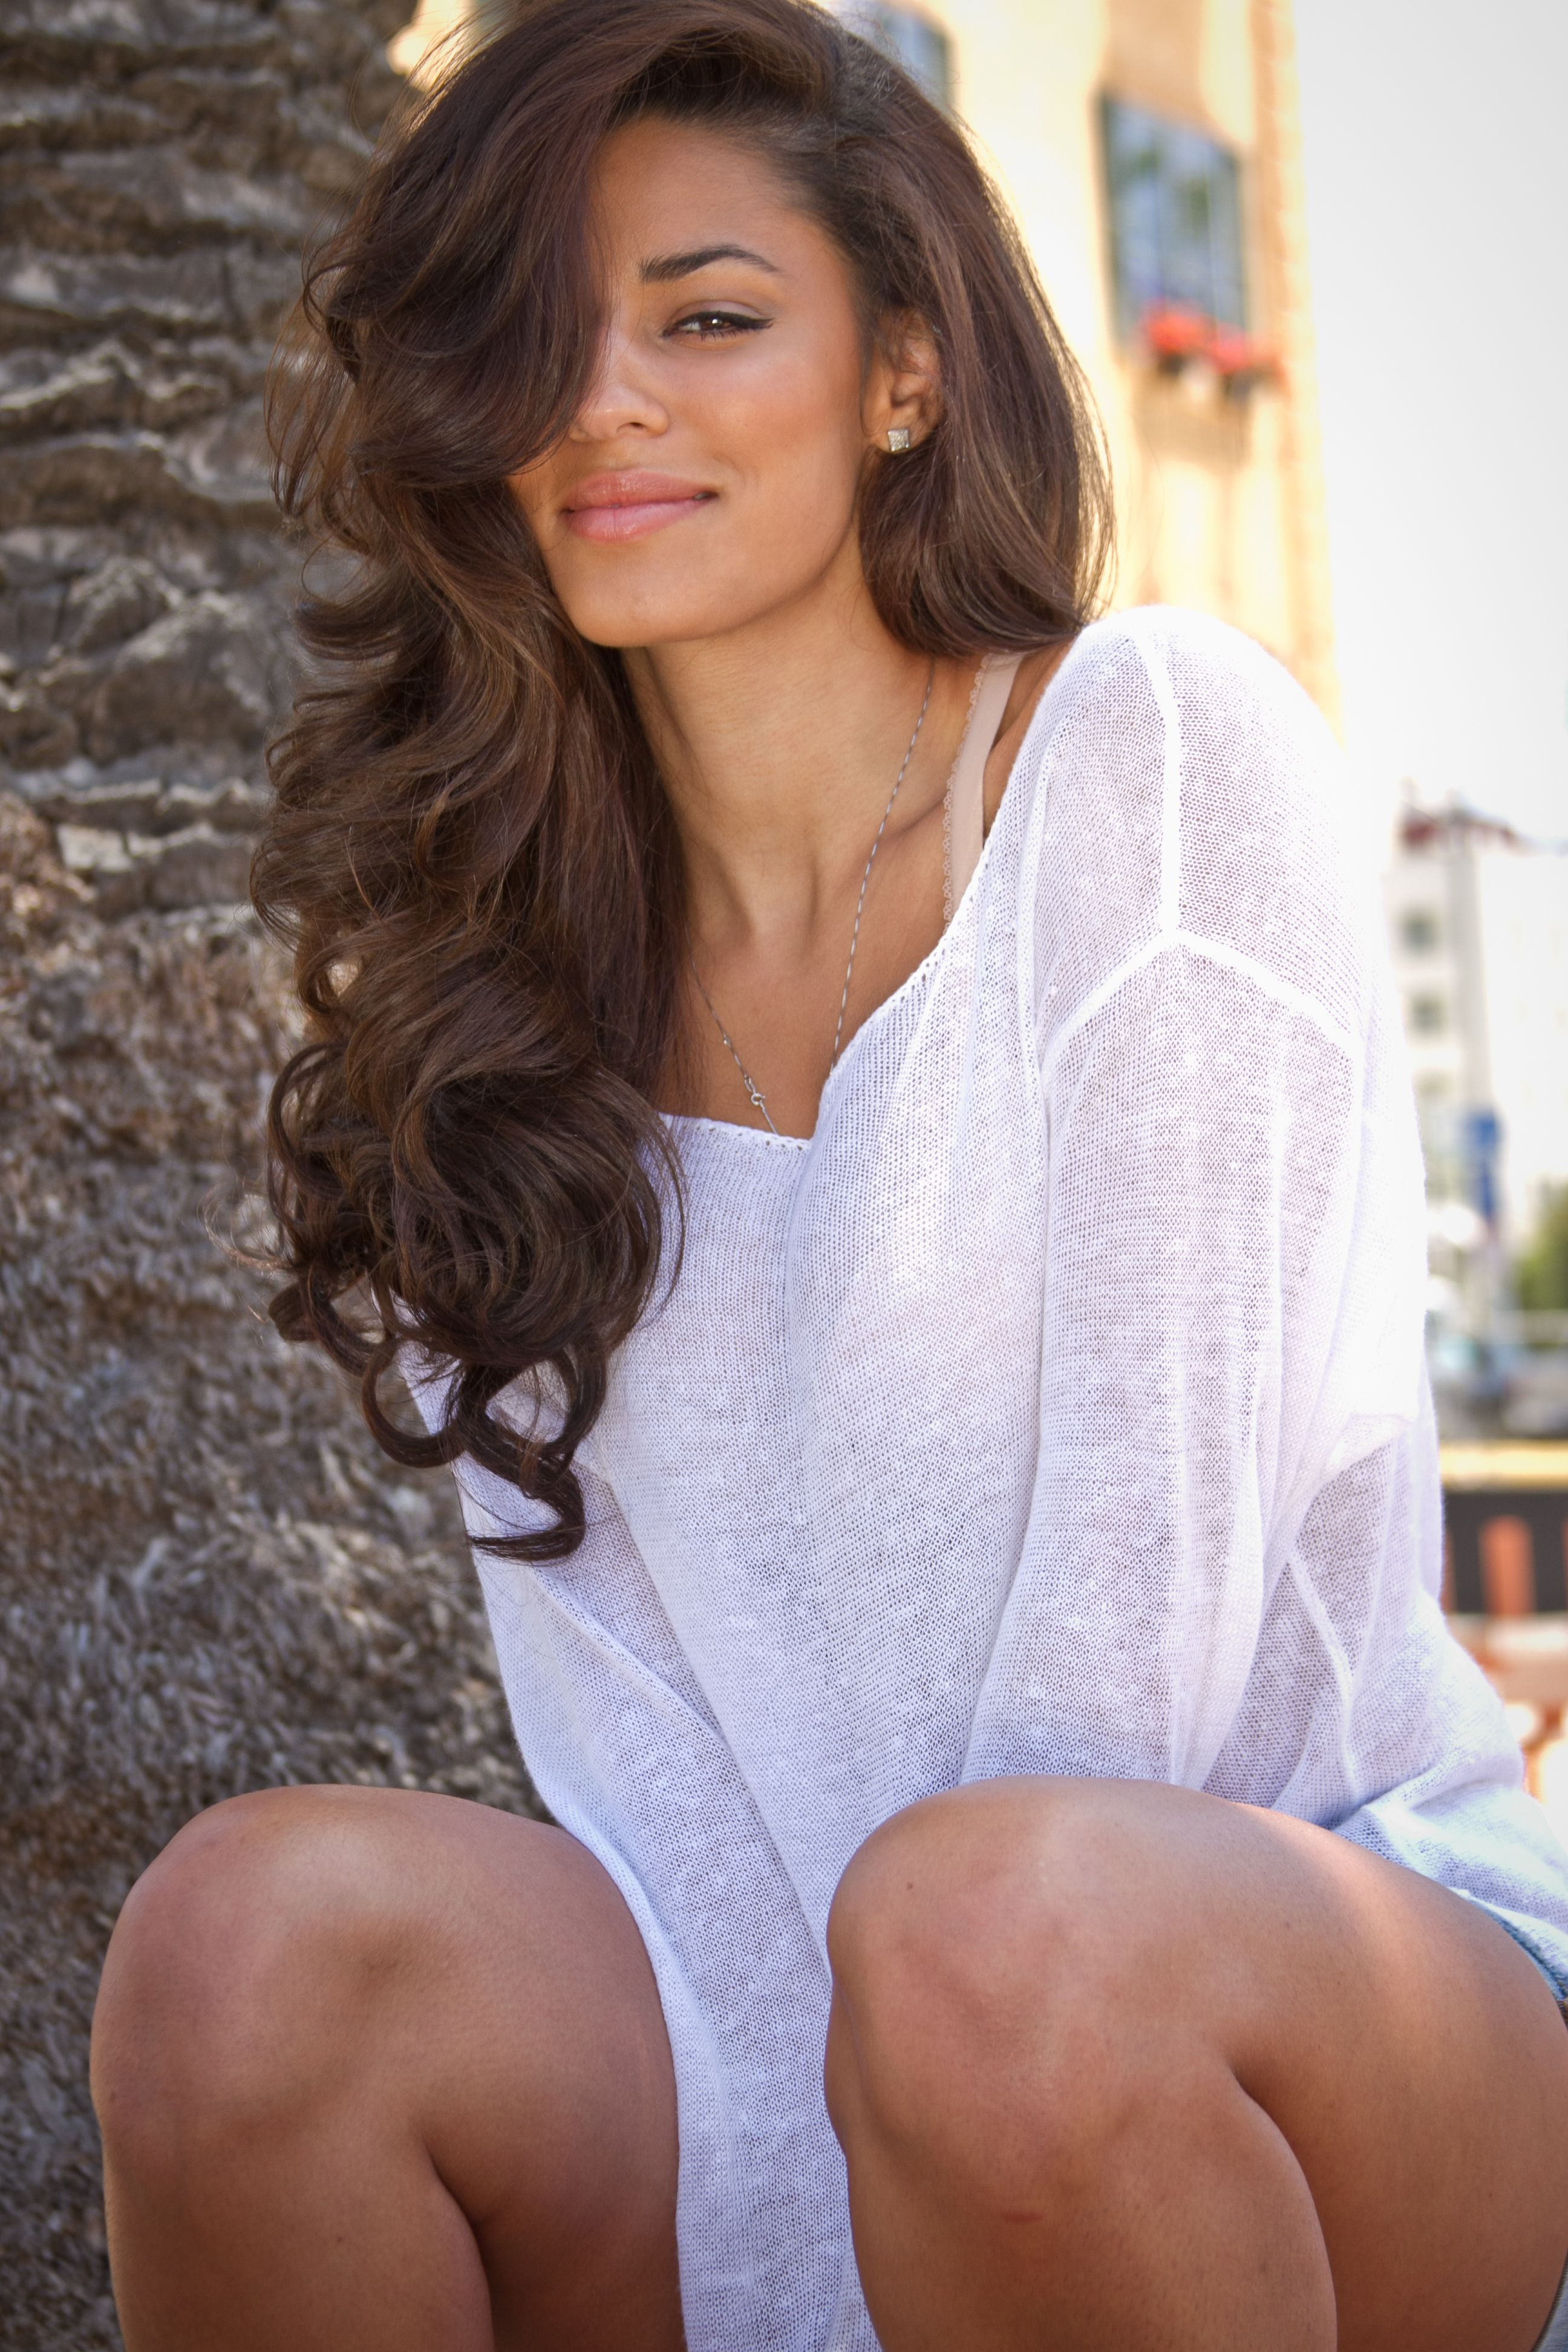 Pretty Ladies Trendy Short Hairstyles 2016: Chelsea Ciara – California Love